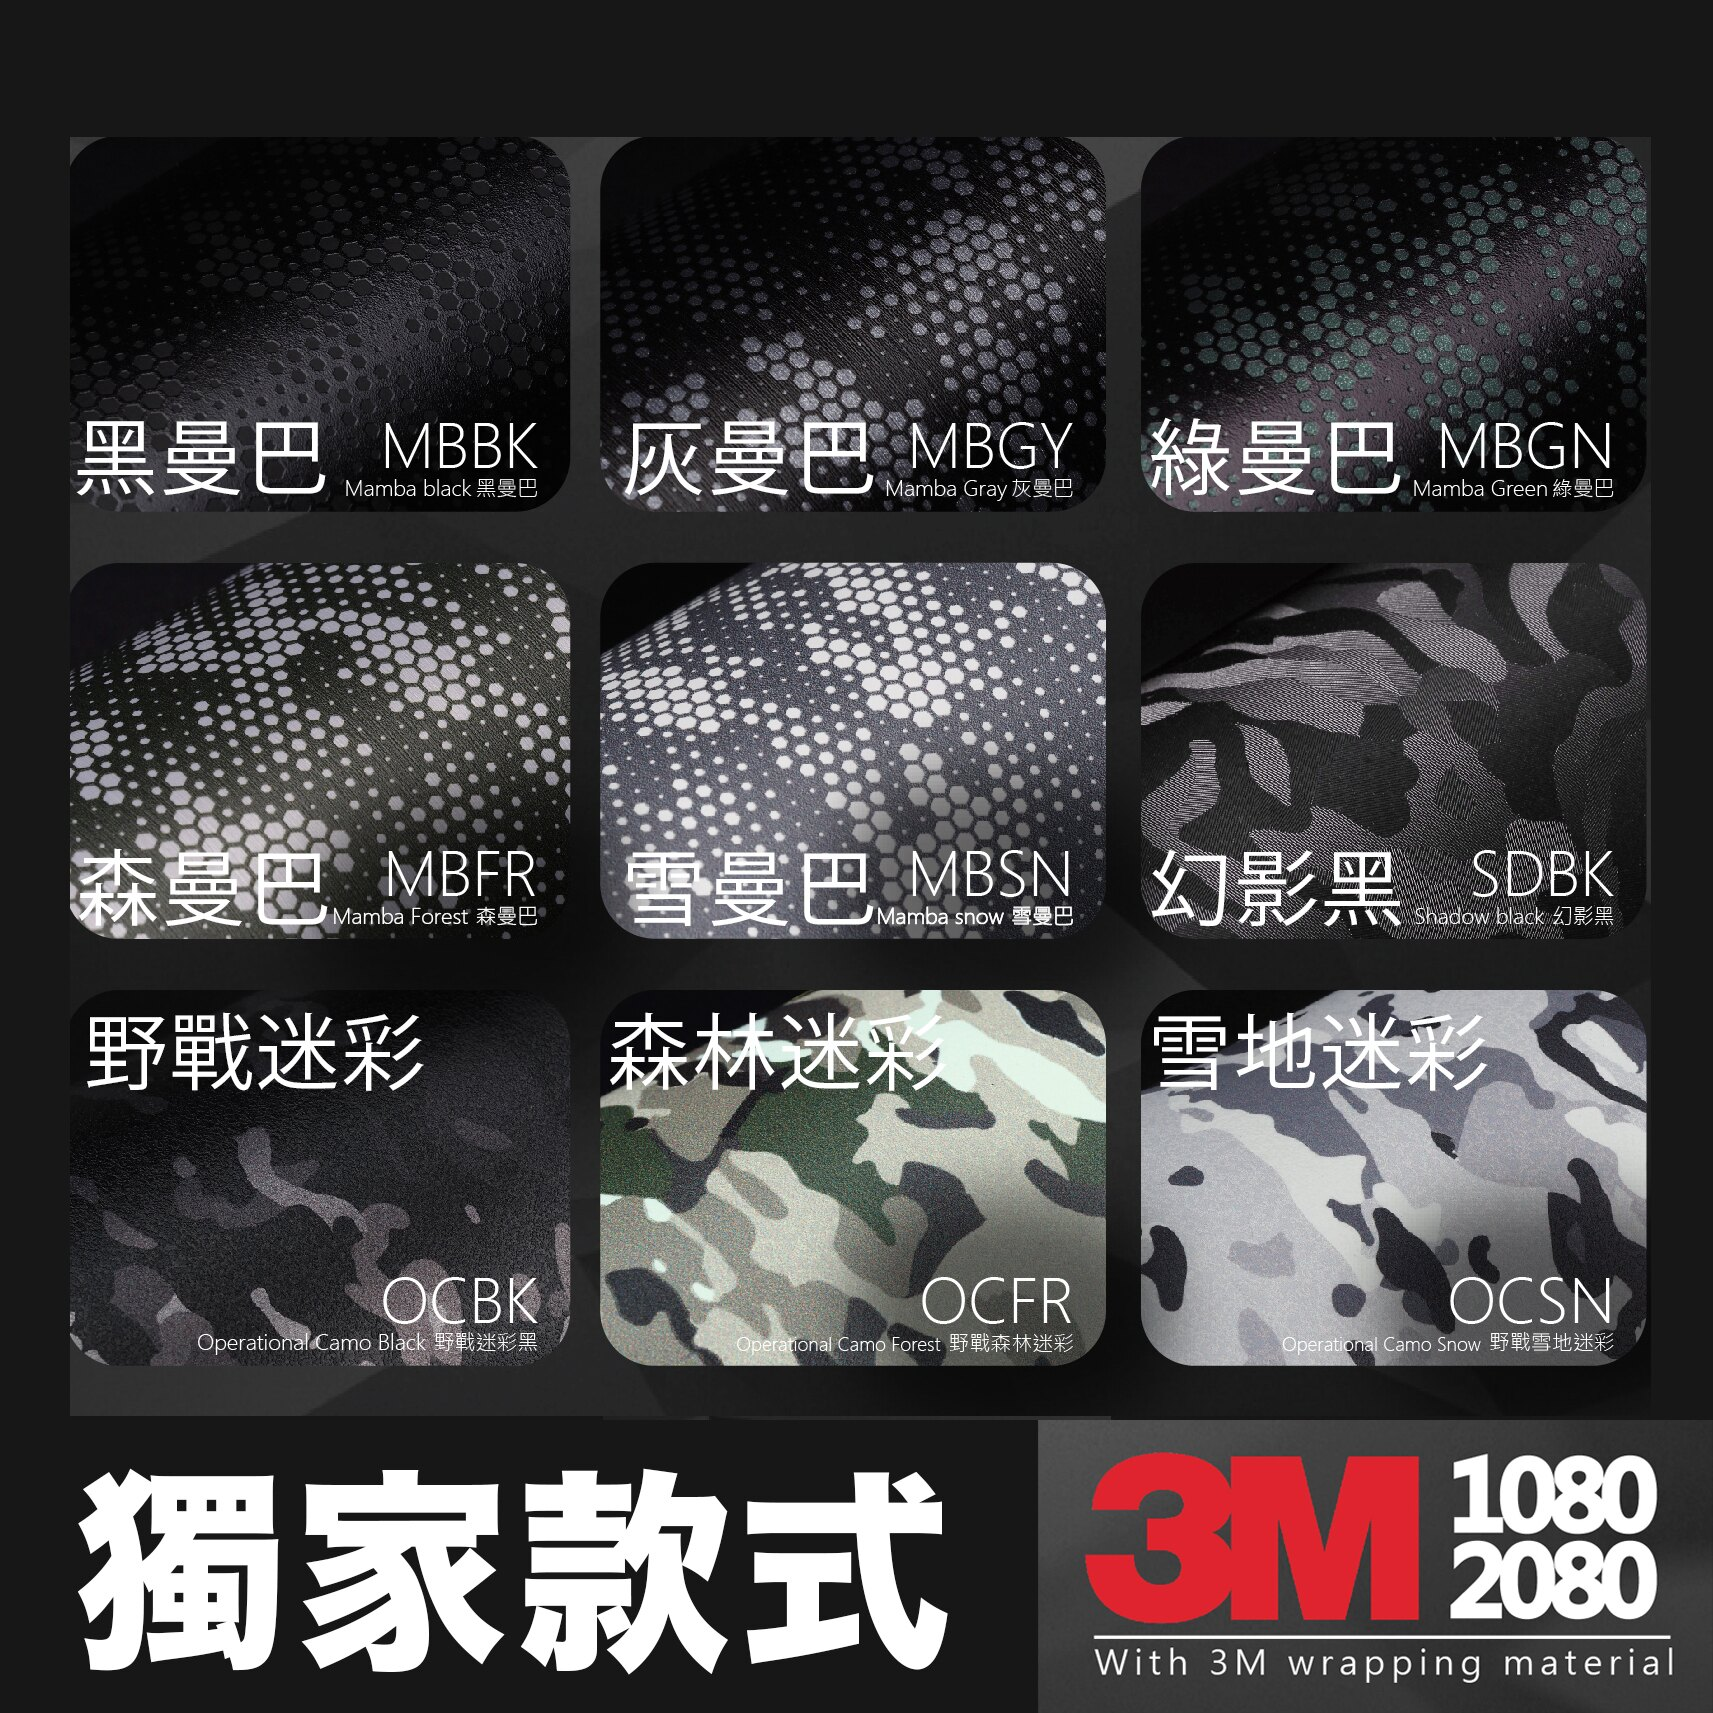 LIFE+GUARD 相機 鏡頭 包膜 FUJIFILM XF 16mm F1.4 R WR  (獨家款式)